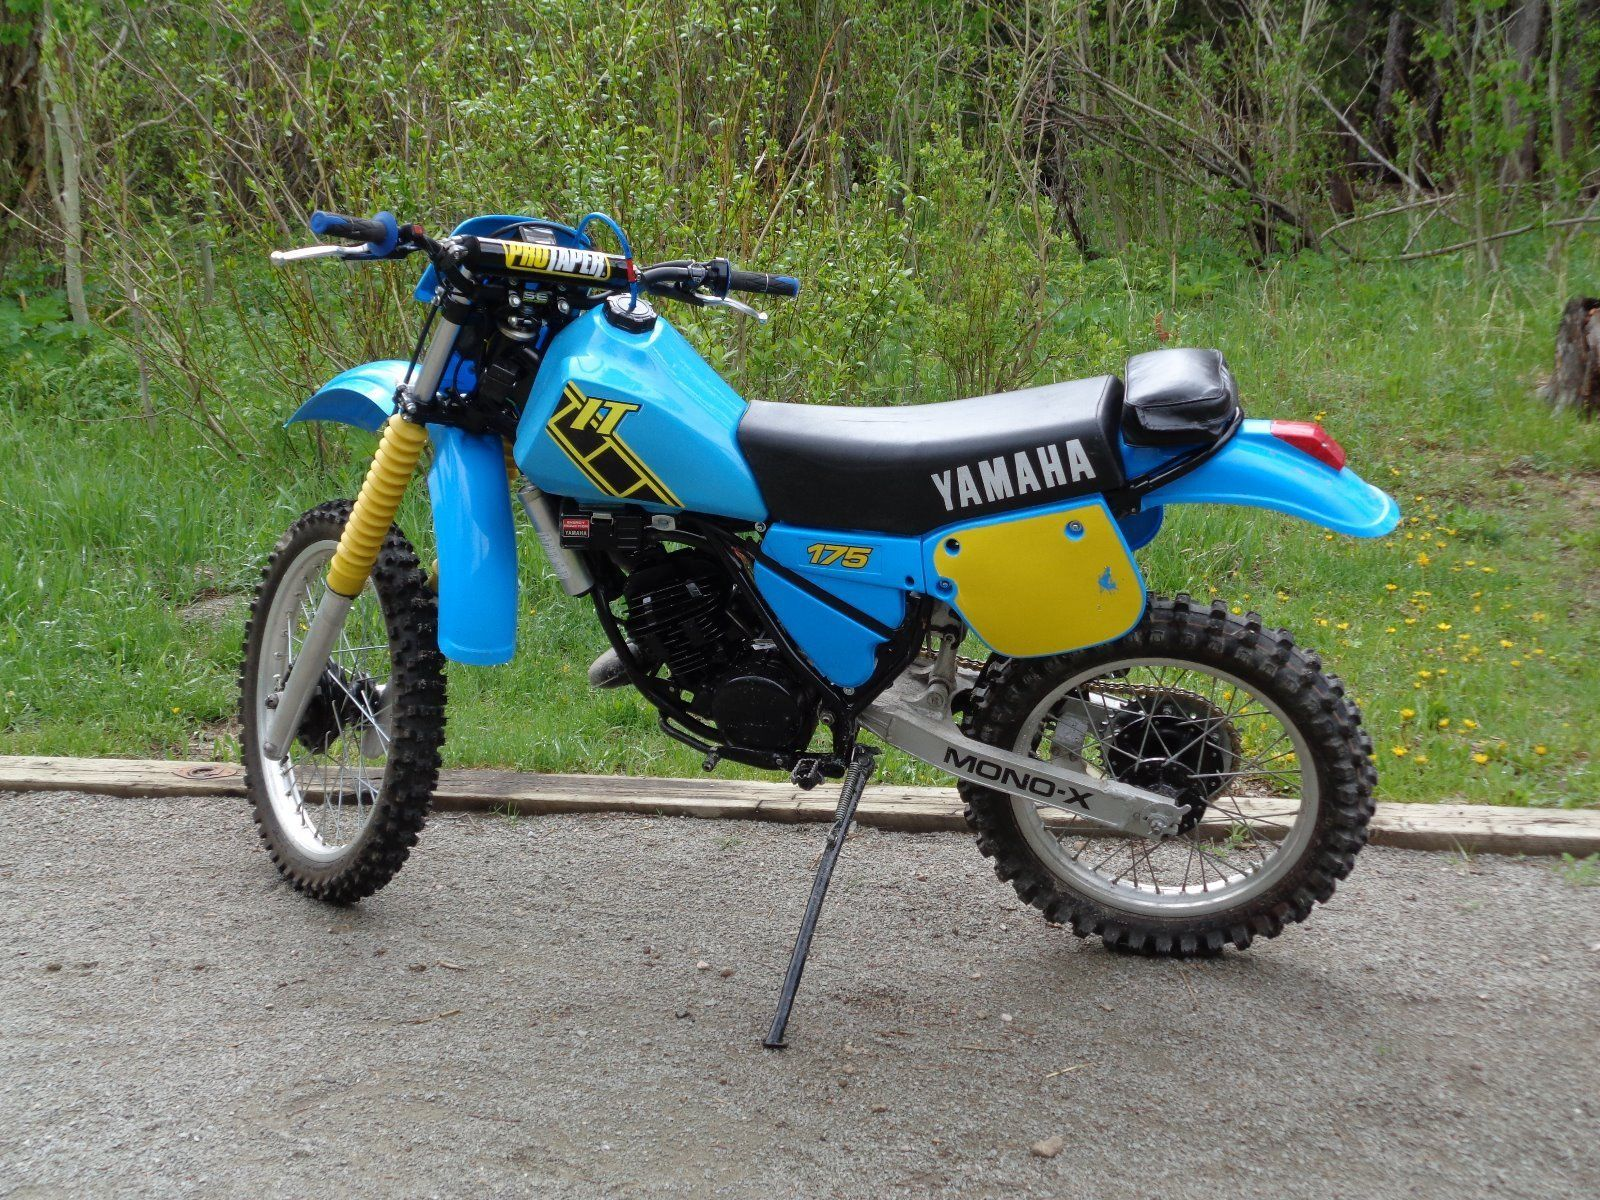 83 1983 Yamaha It 175 Xv500 Virago Parts Project Bike Wiring Diagram It175